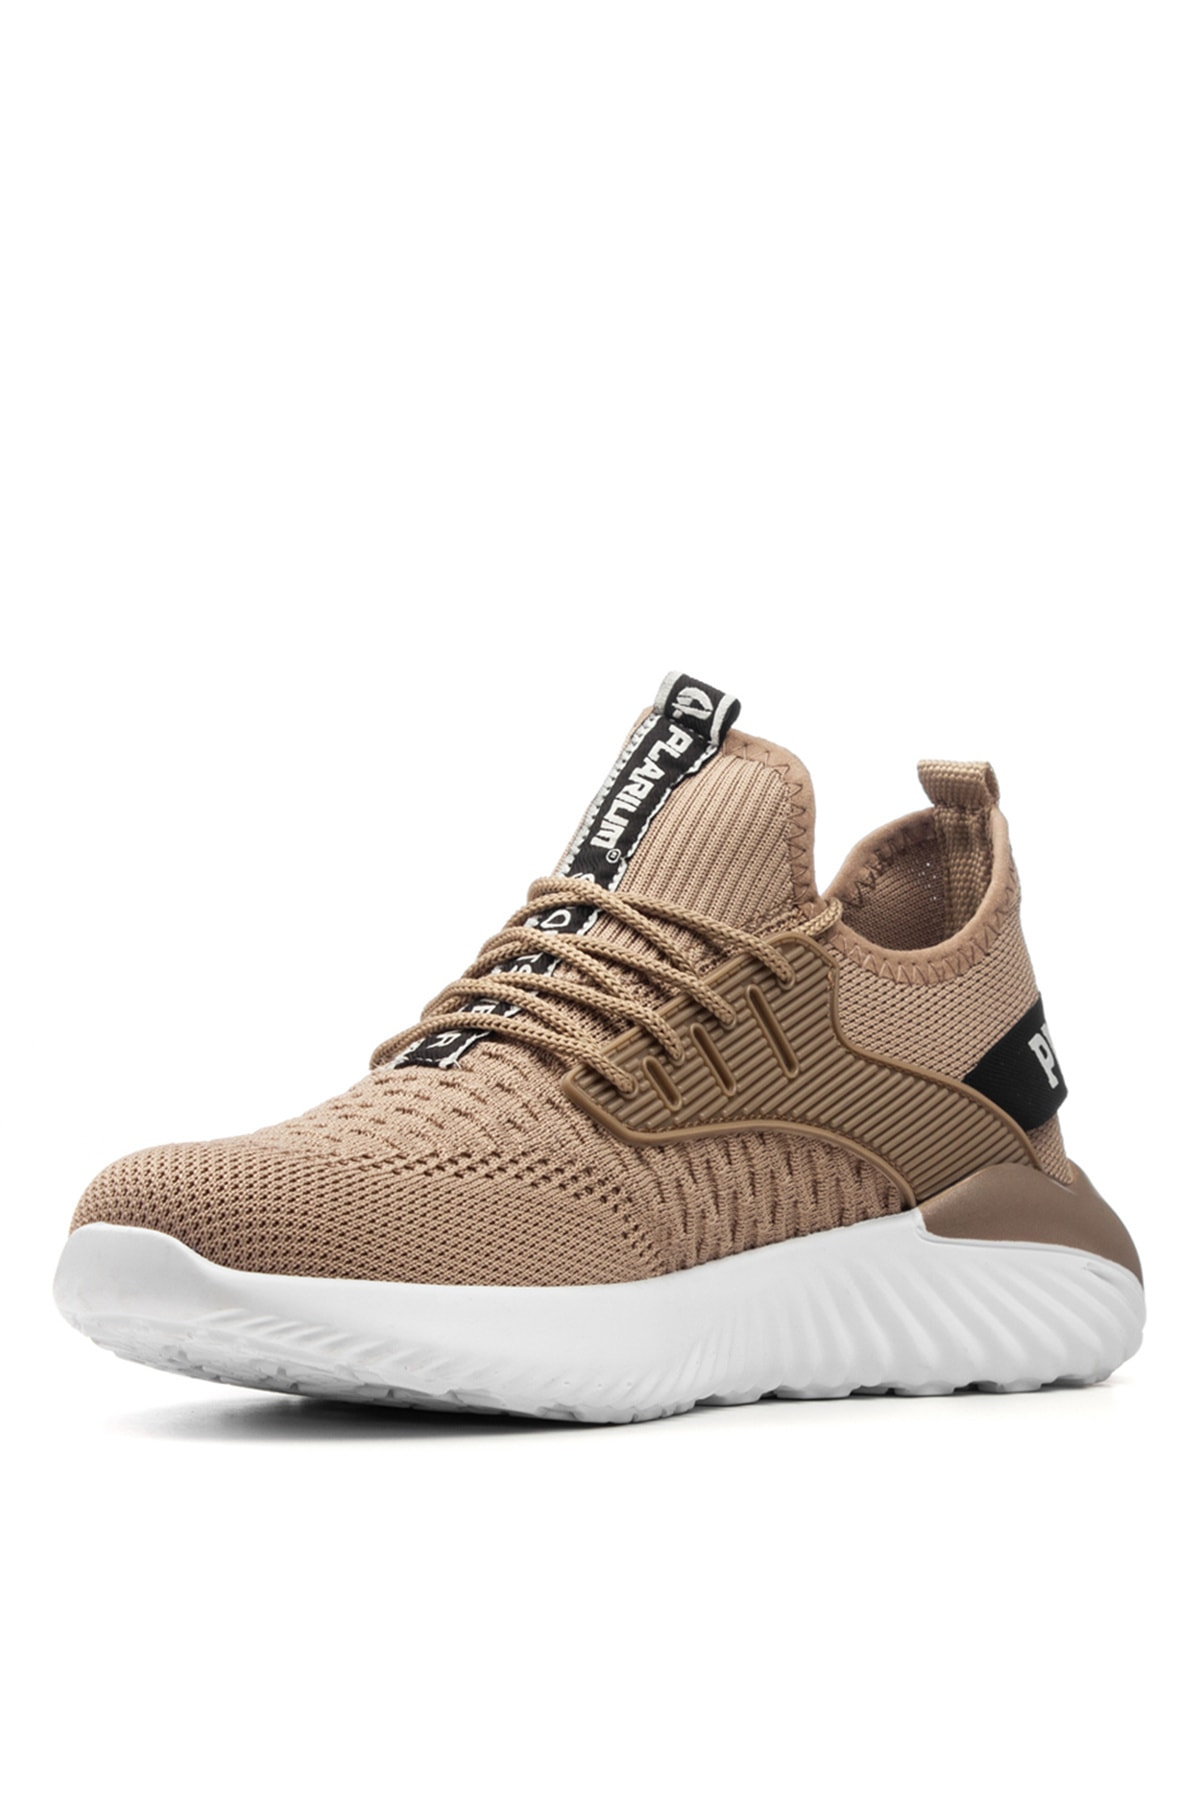 ICELAKE Unisex Triko Sneaker Ayakkabı 085044-01 2